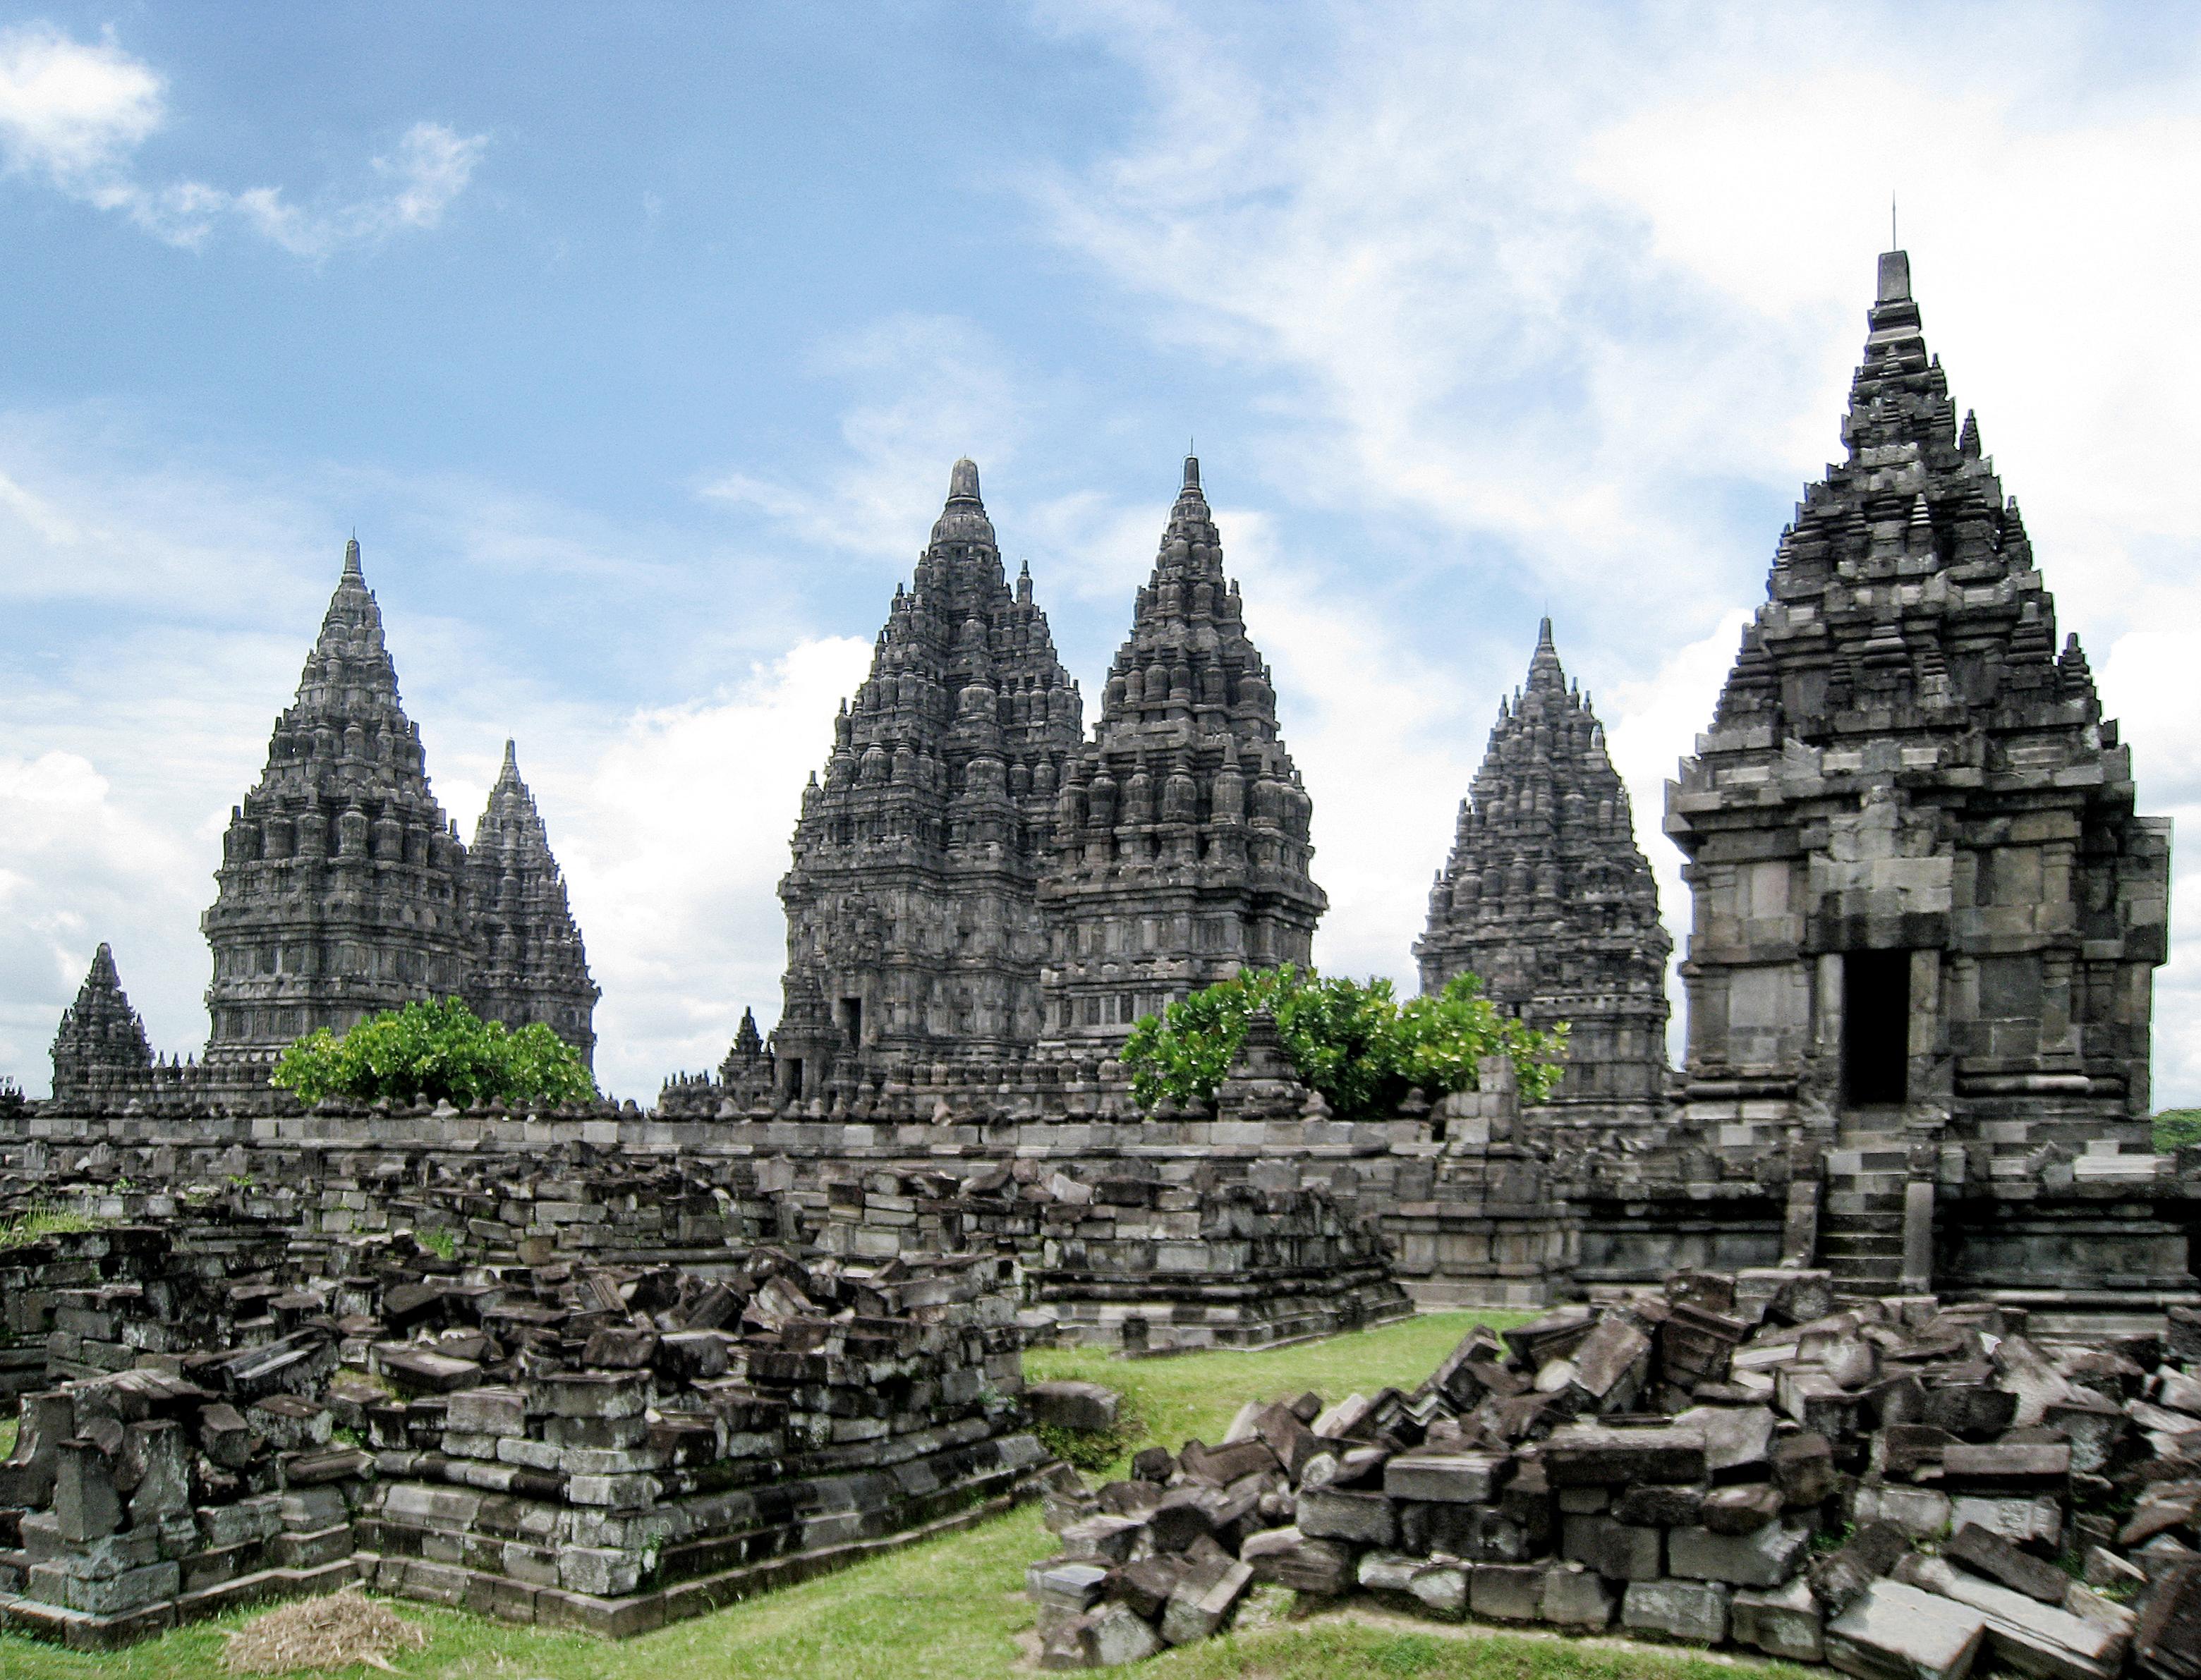 Candi Indonesia Wikipedia Terminology Edit Arca Totok Kerot Kab Kediri